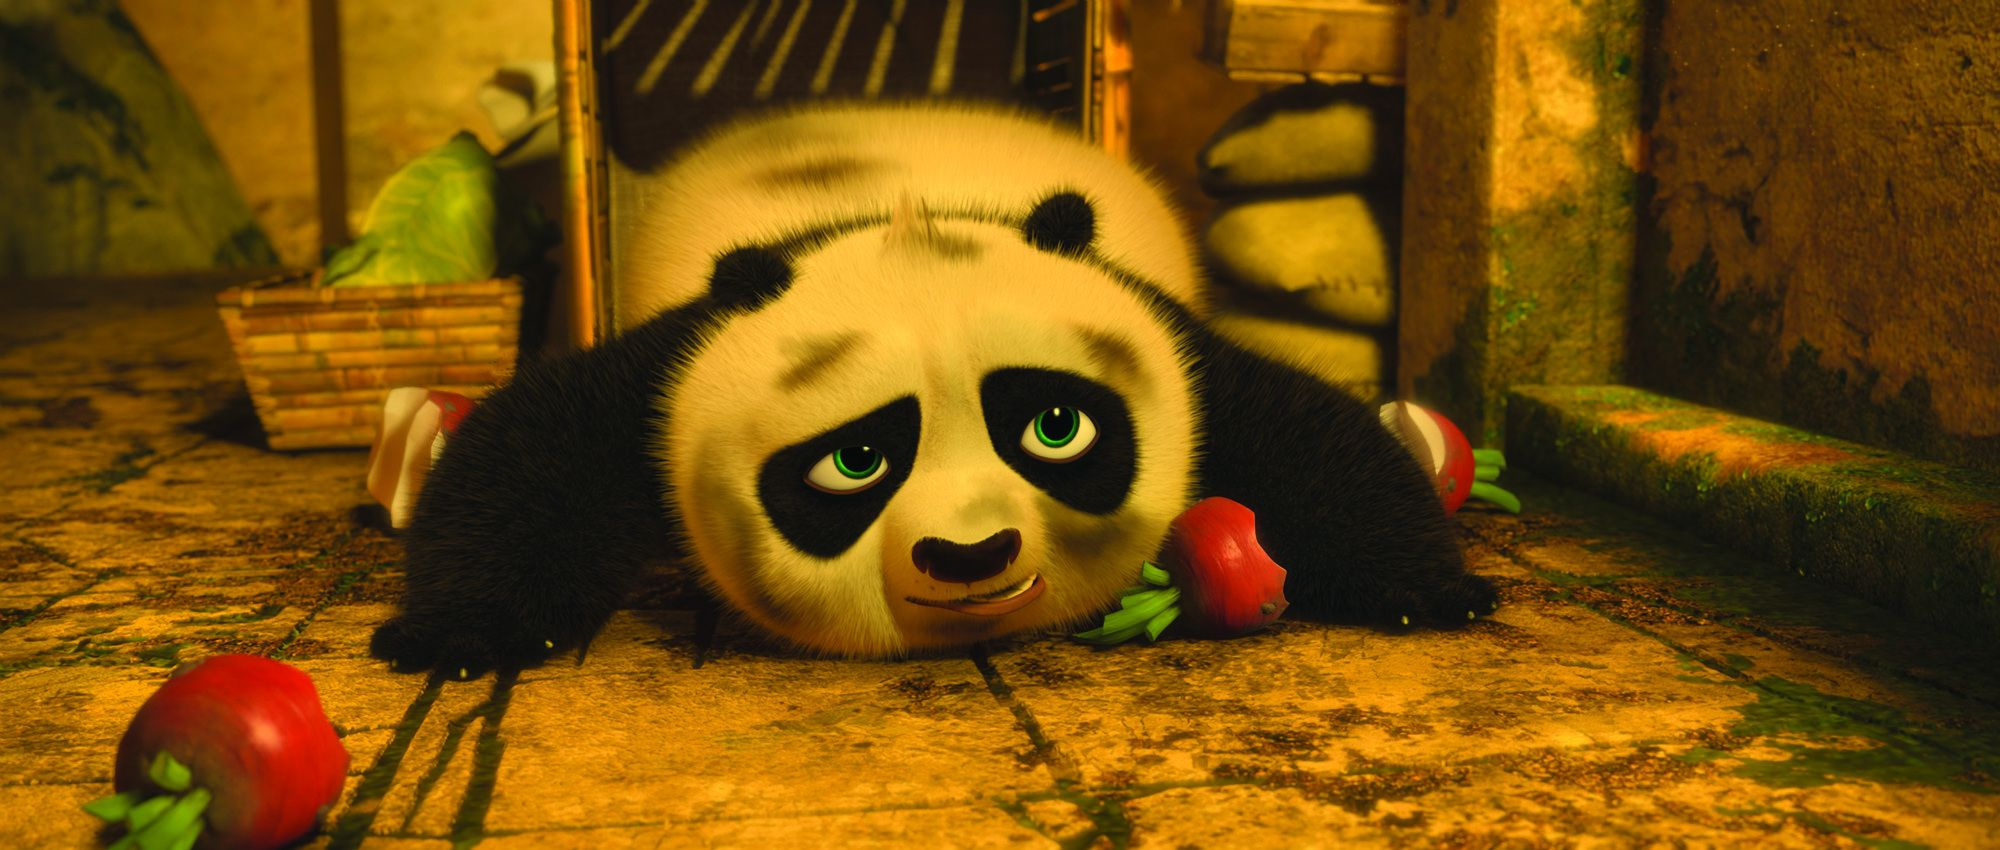 Pin Di Kung Fu Panda